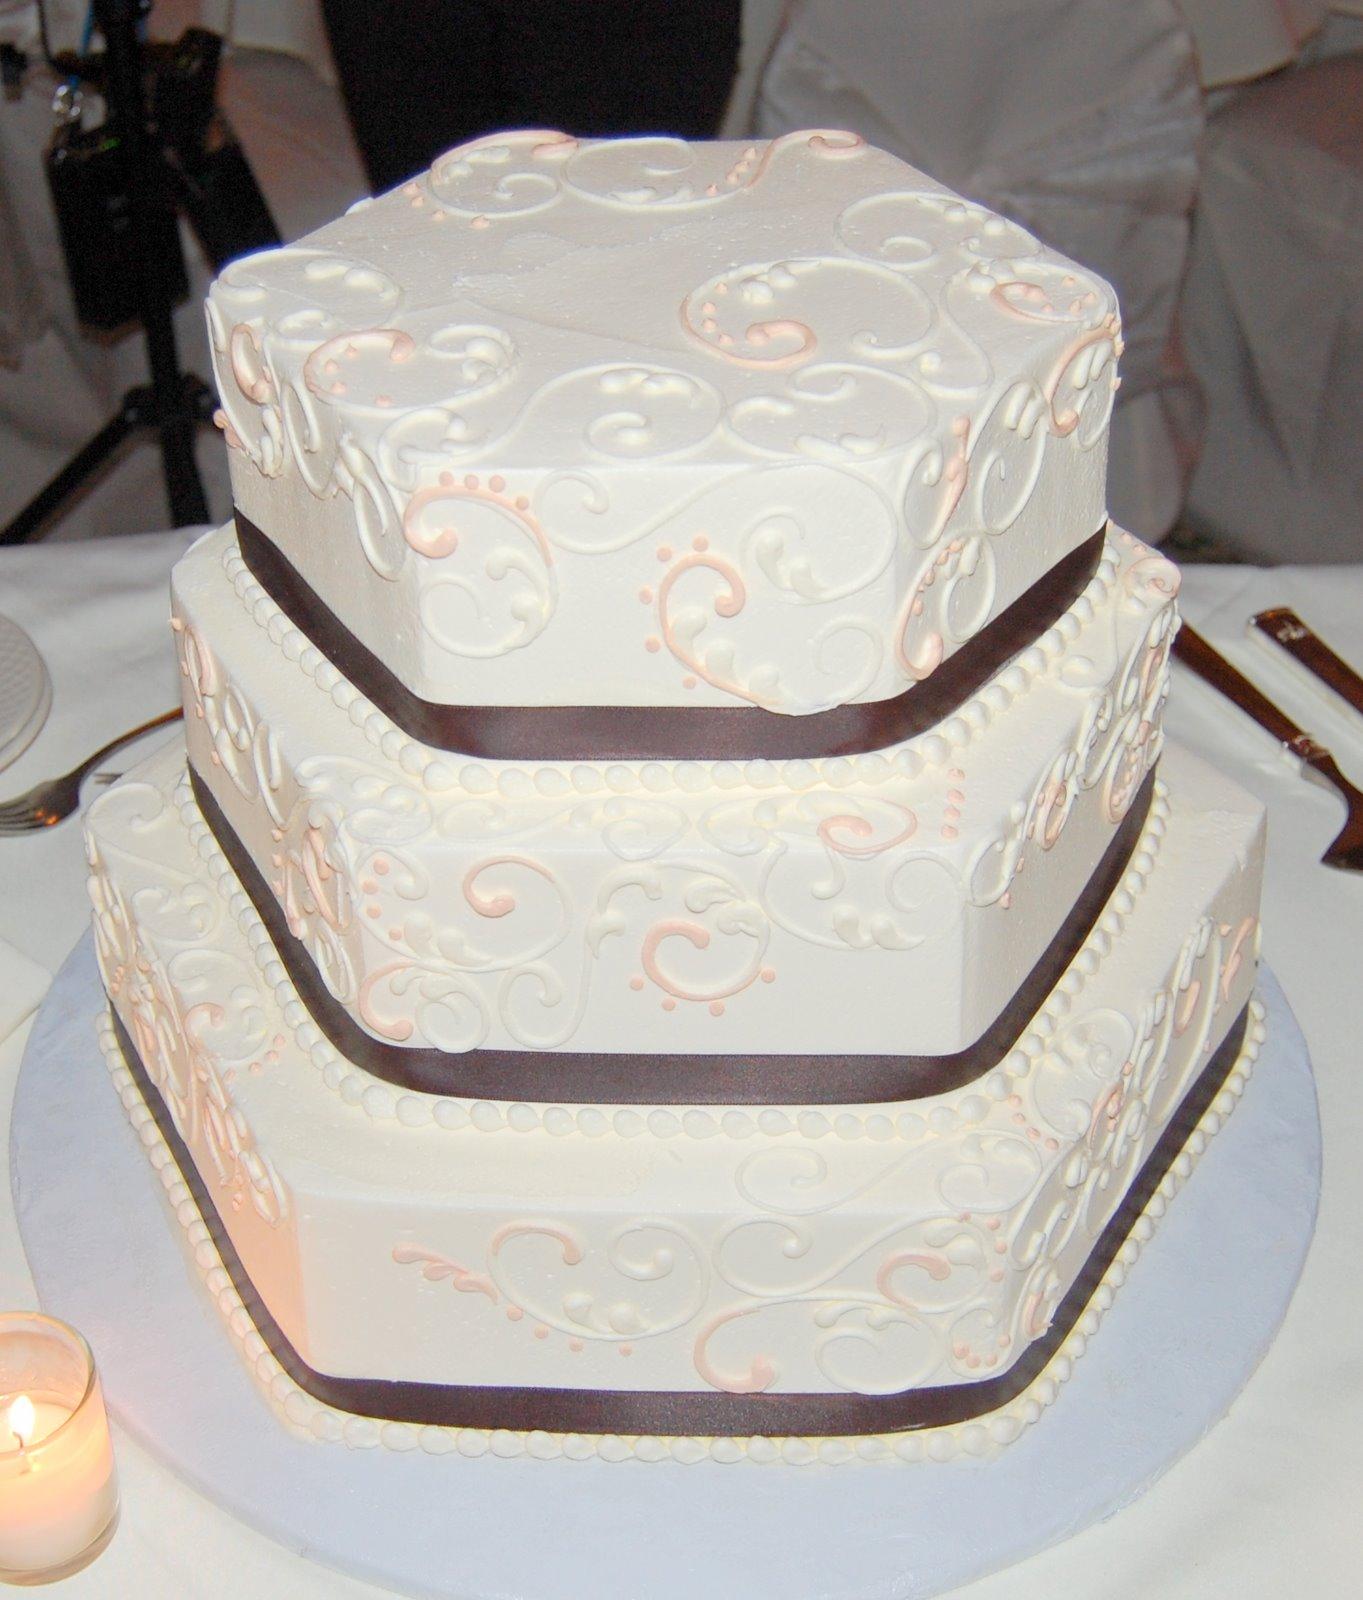 A very unique wedding cake